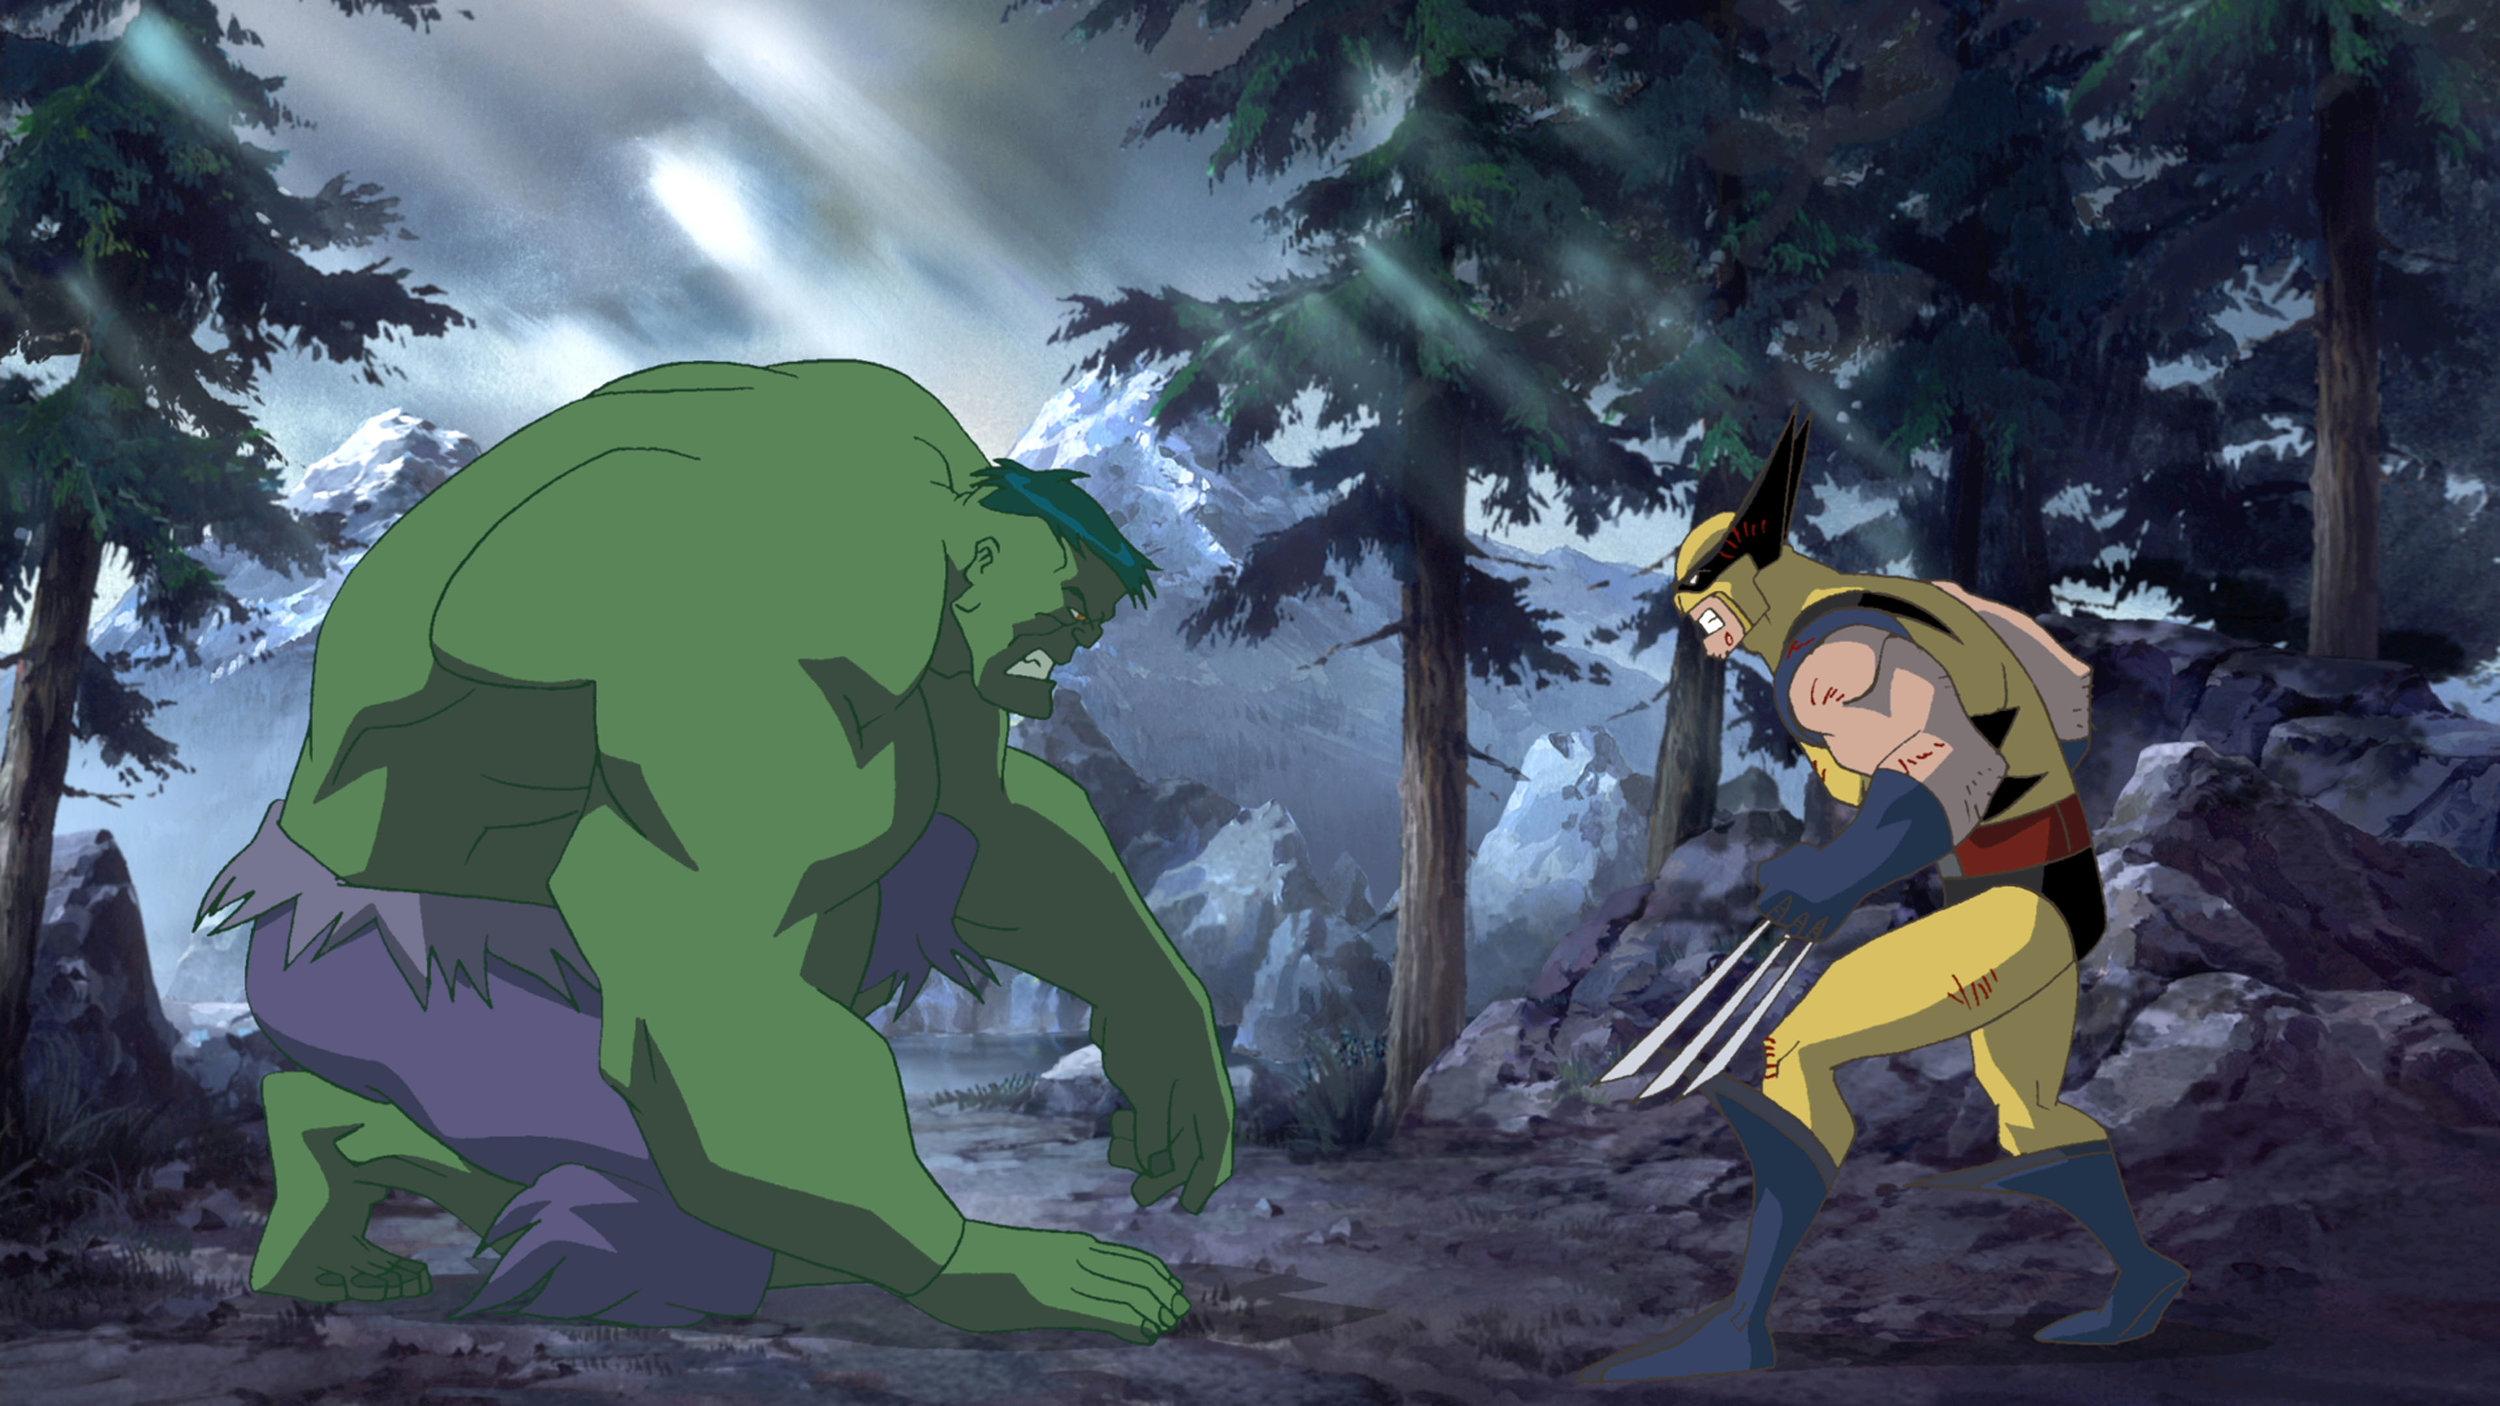 Cool Storyboard Art For Marvel's HULK VS. WOLVERINE Animated Film —  GeekTyrant